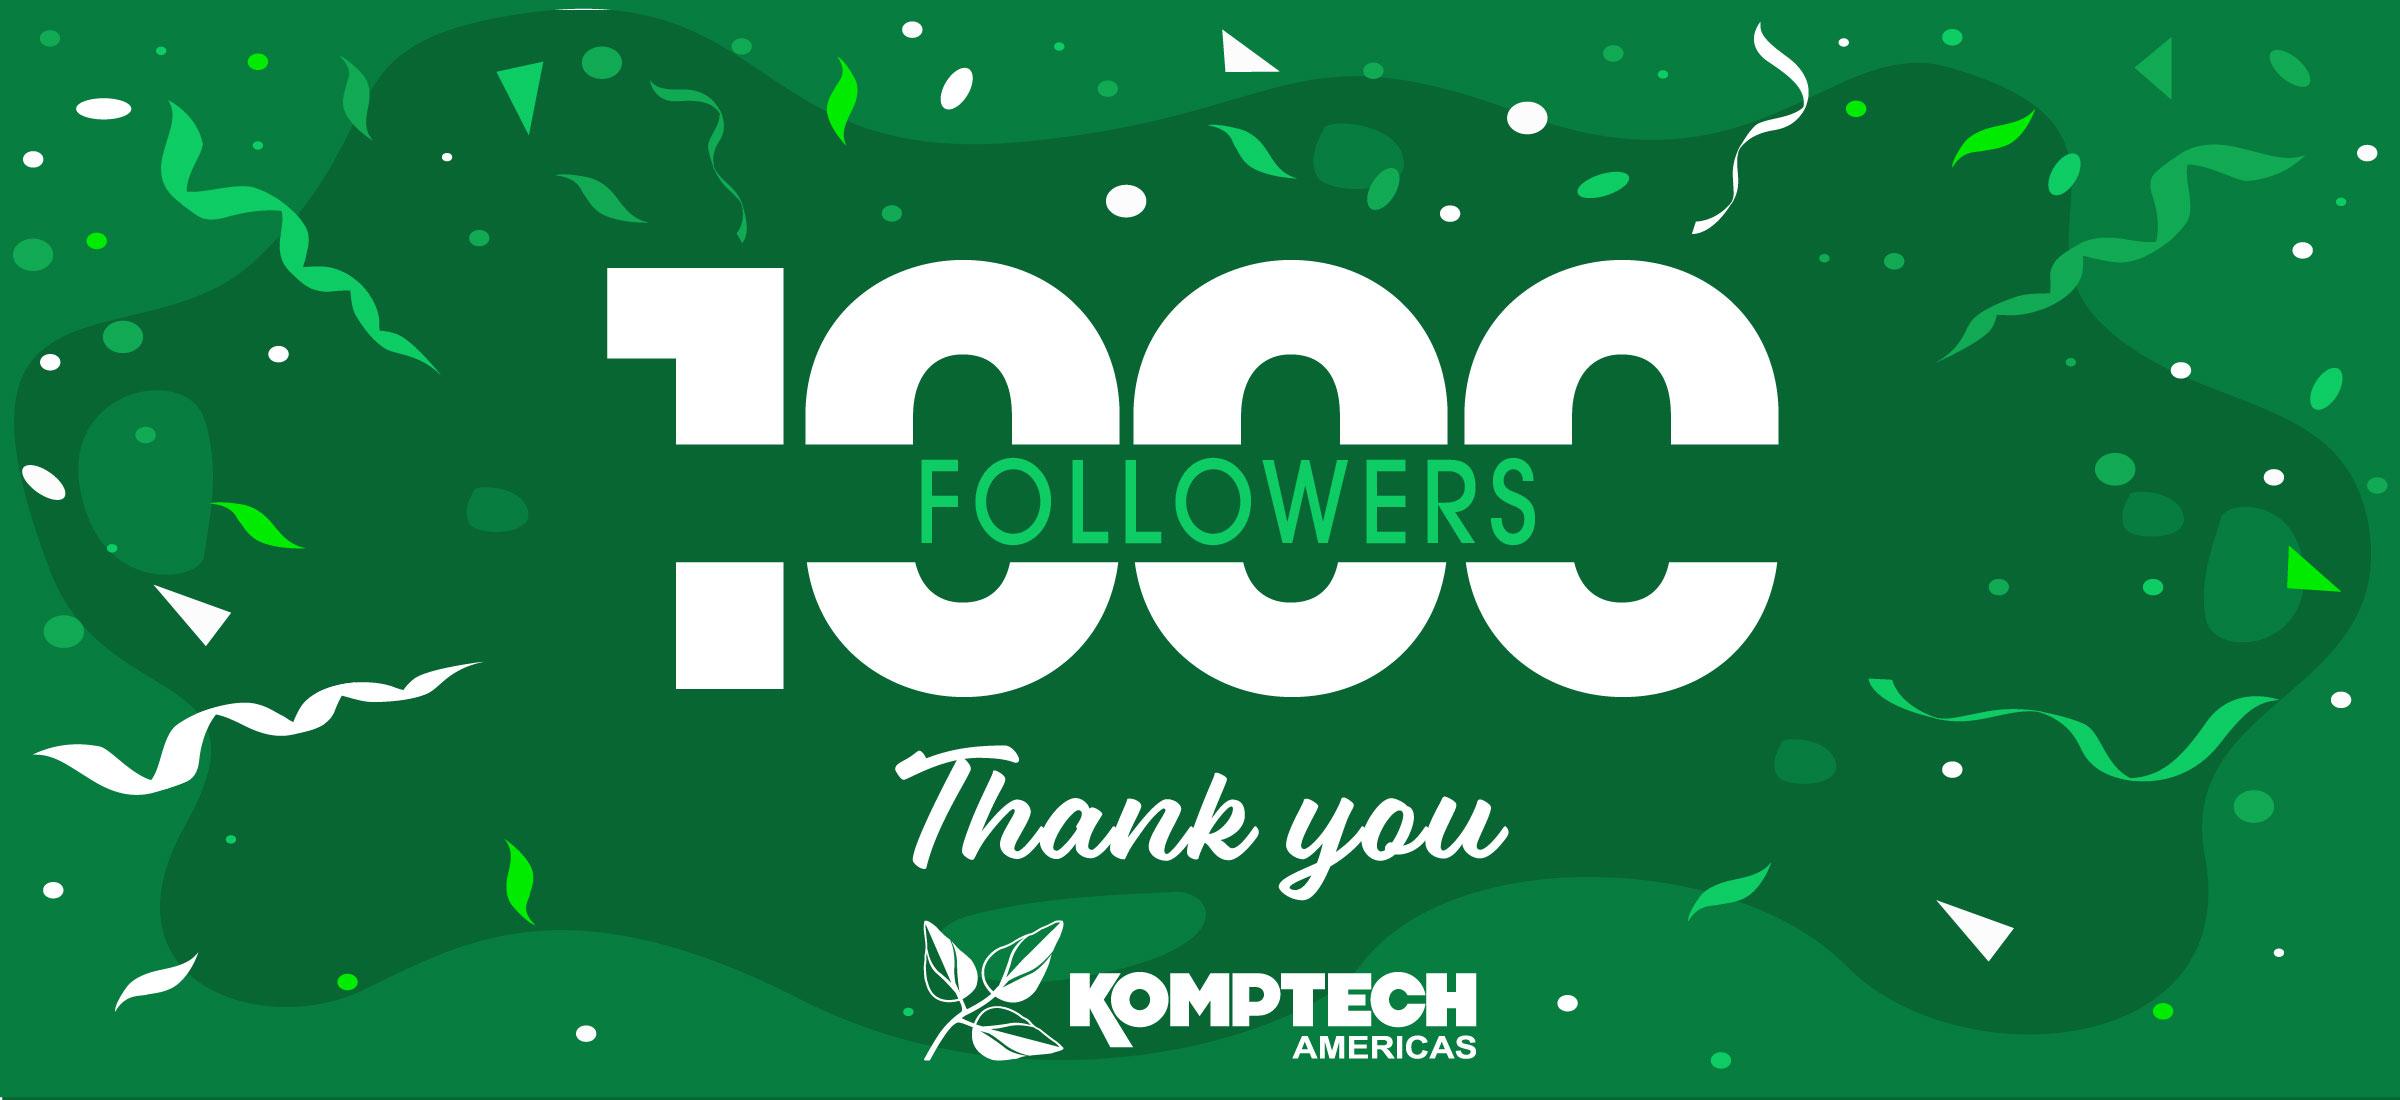 Komptech Americas reaches 1,000 followers on LinkedIn